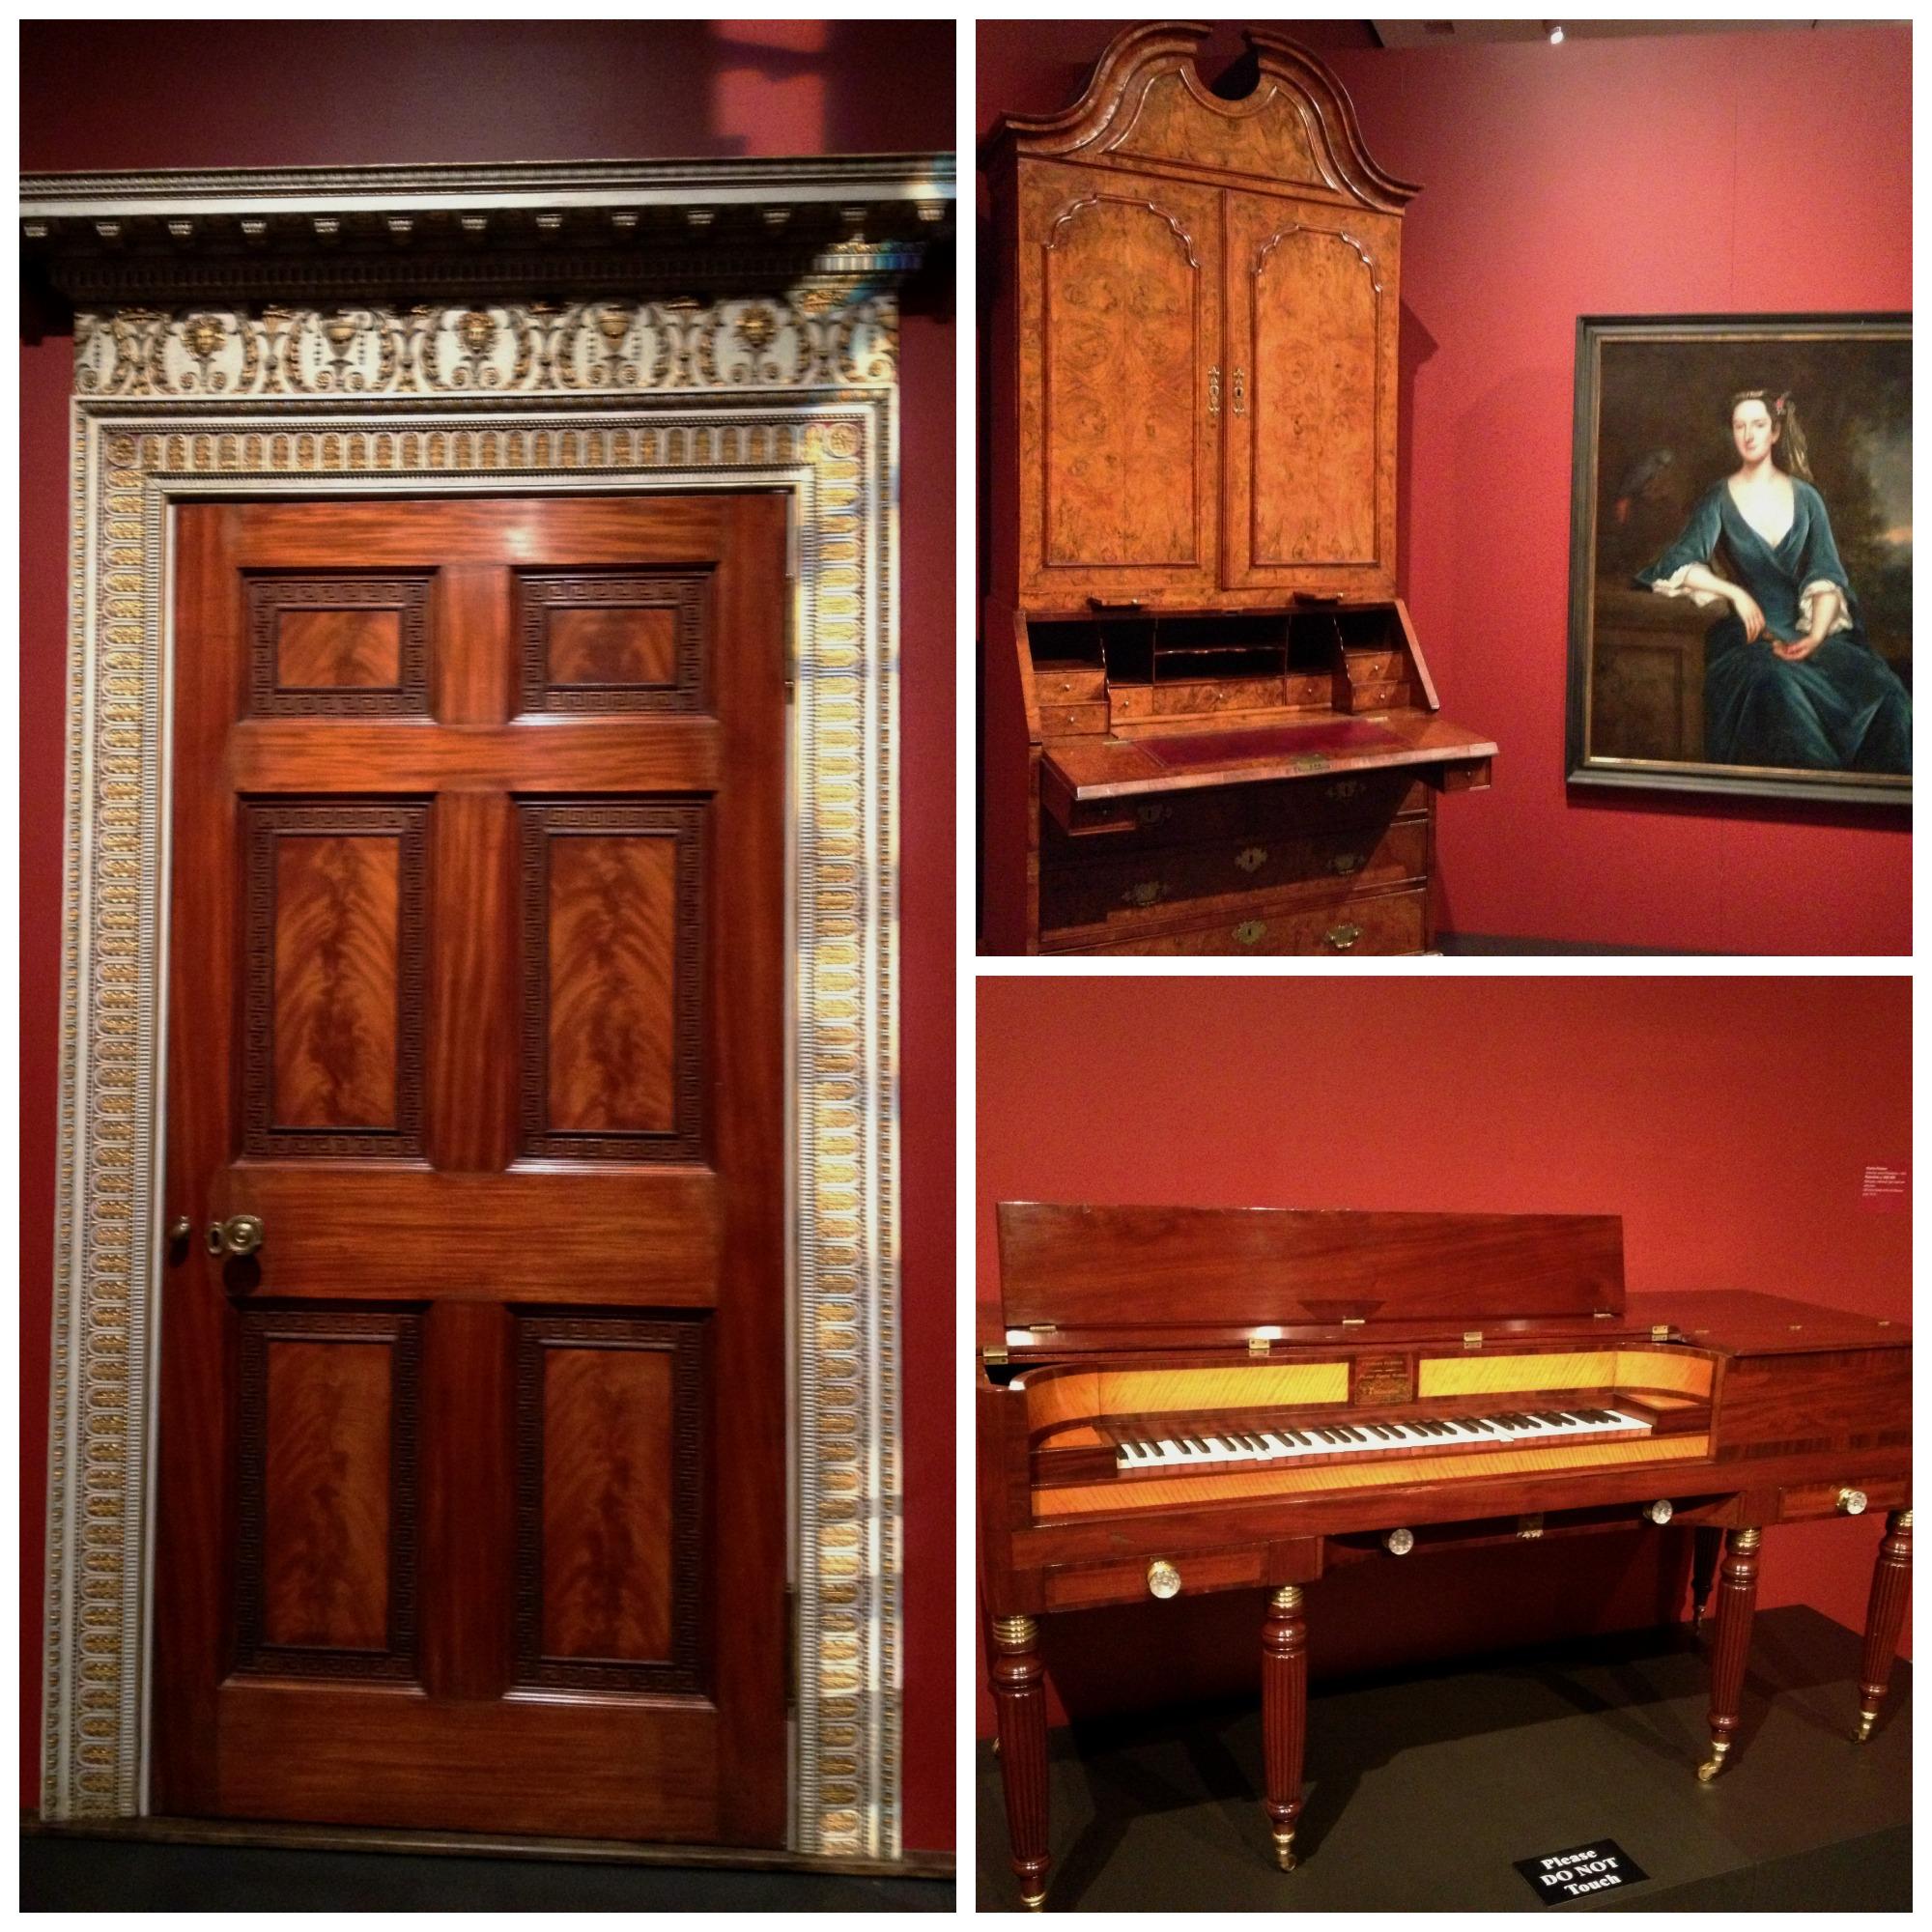 Furniture at LSU Museum of Art